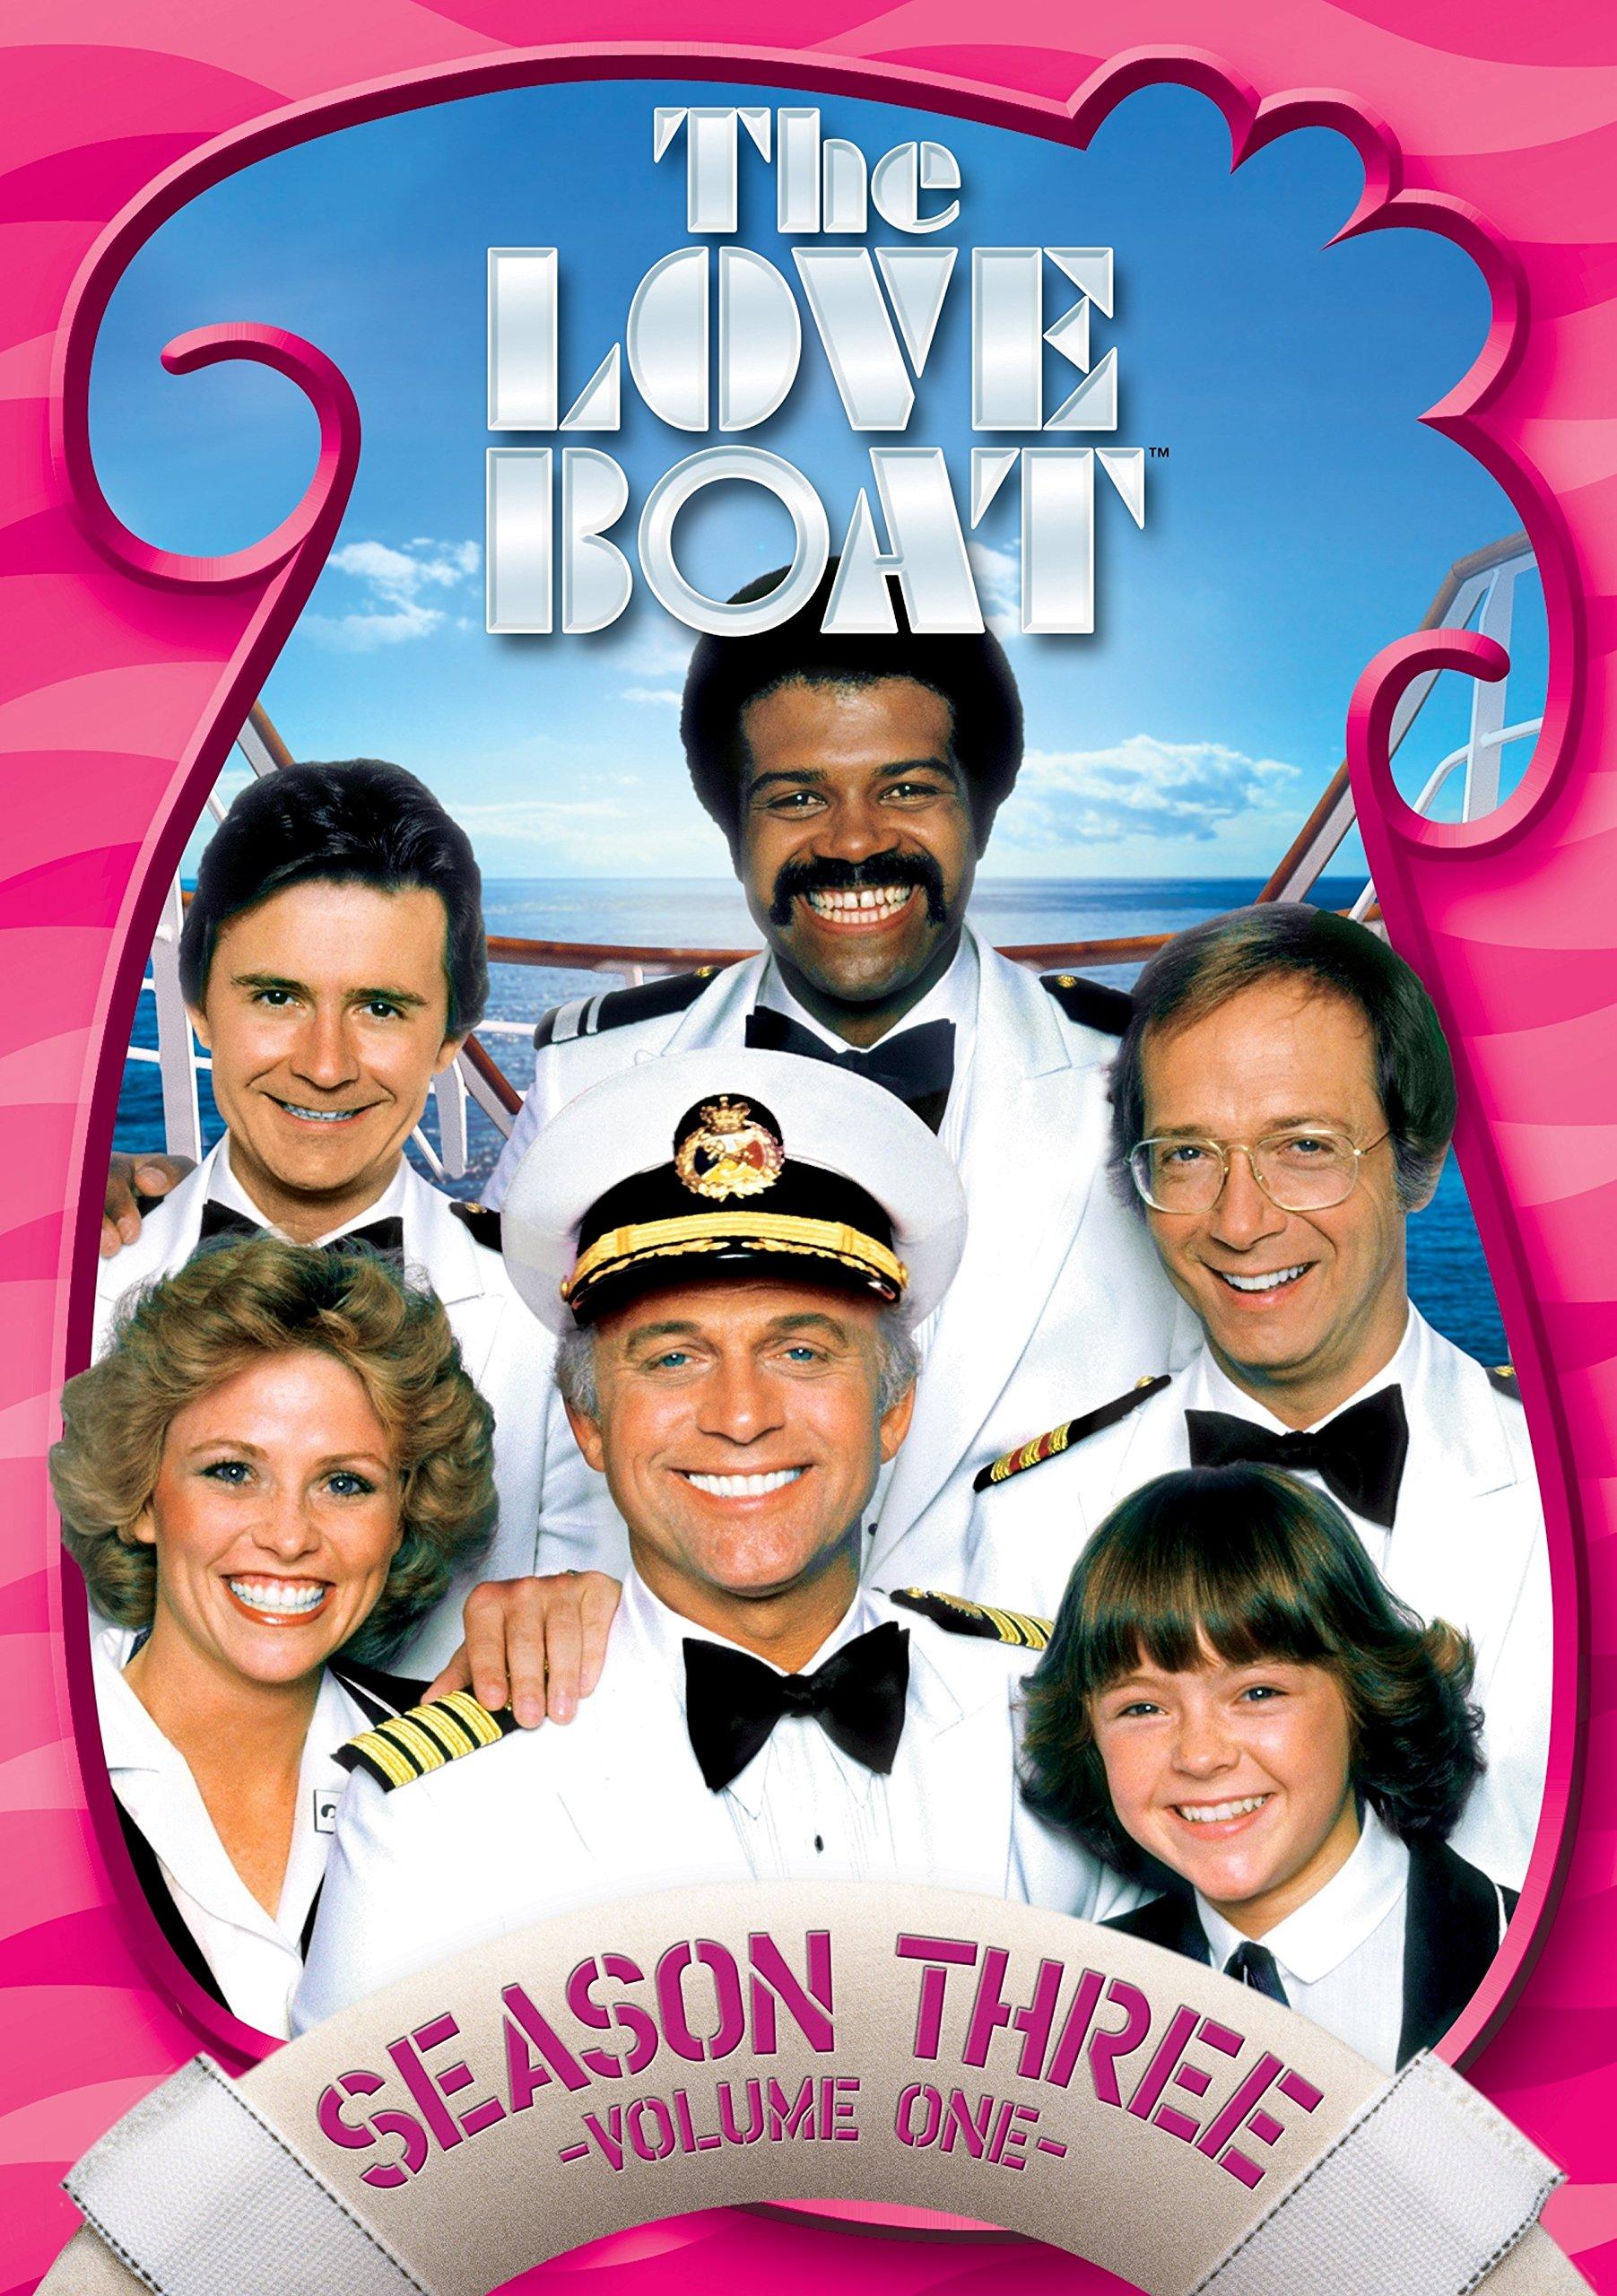 Love Boat: Season Three Volume One